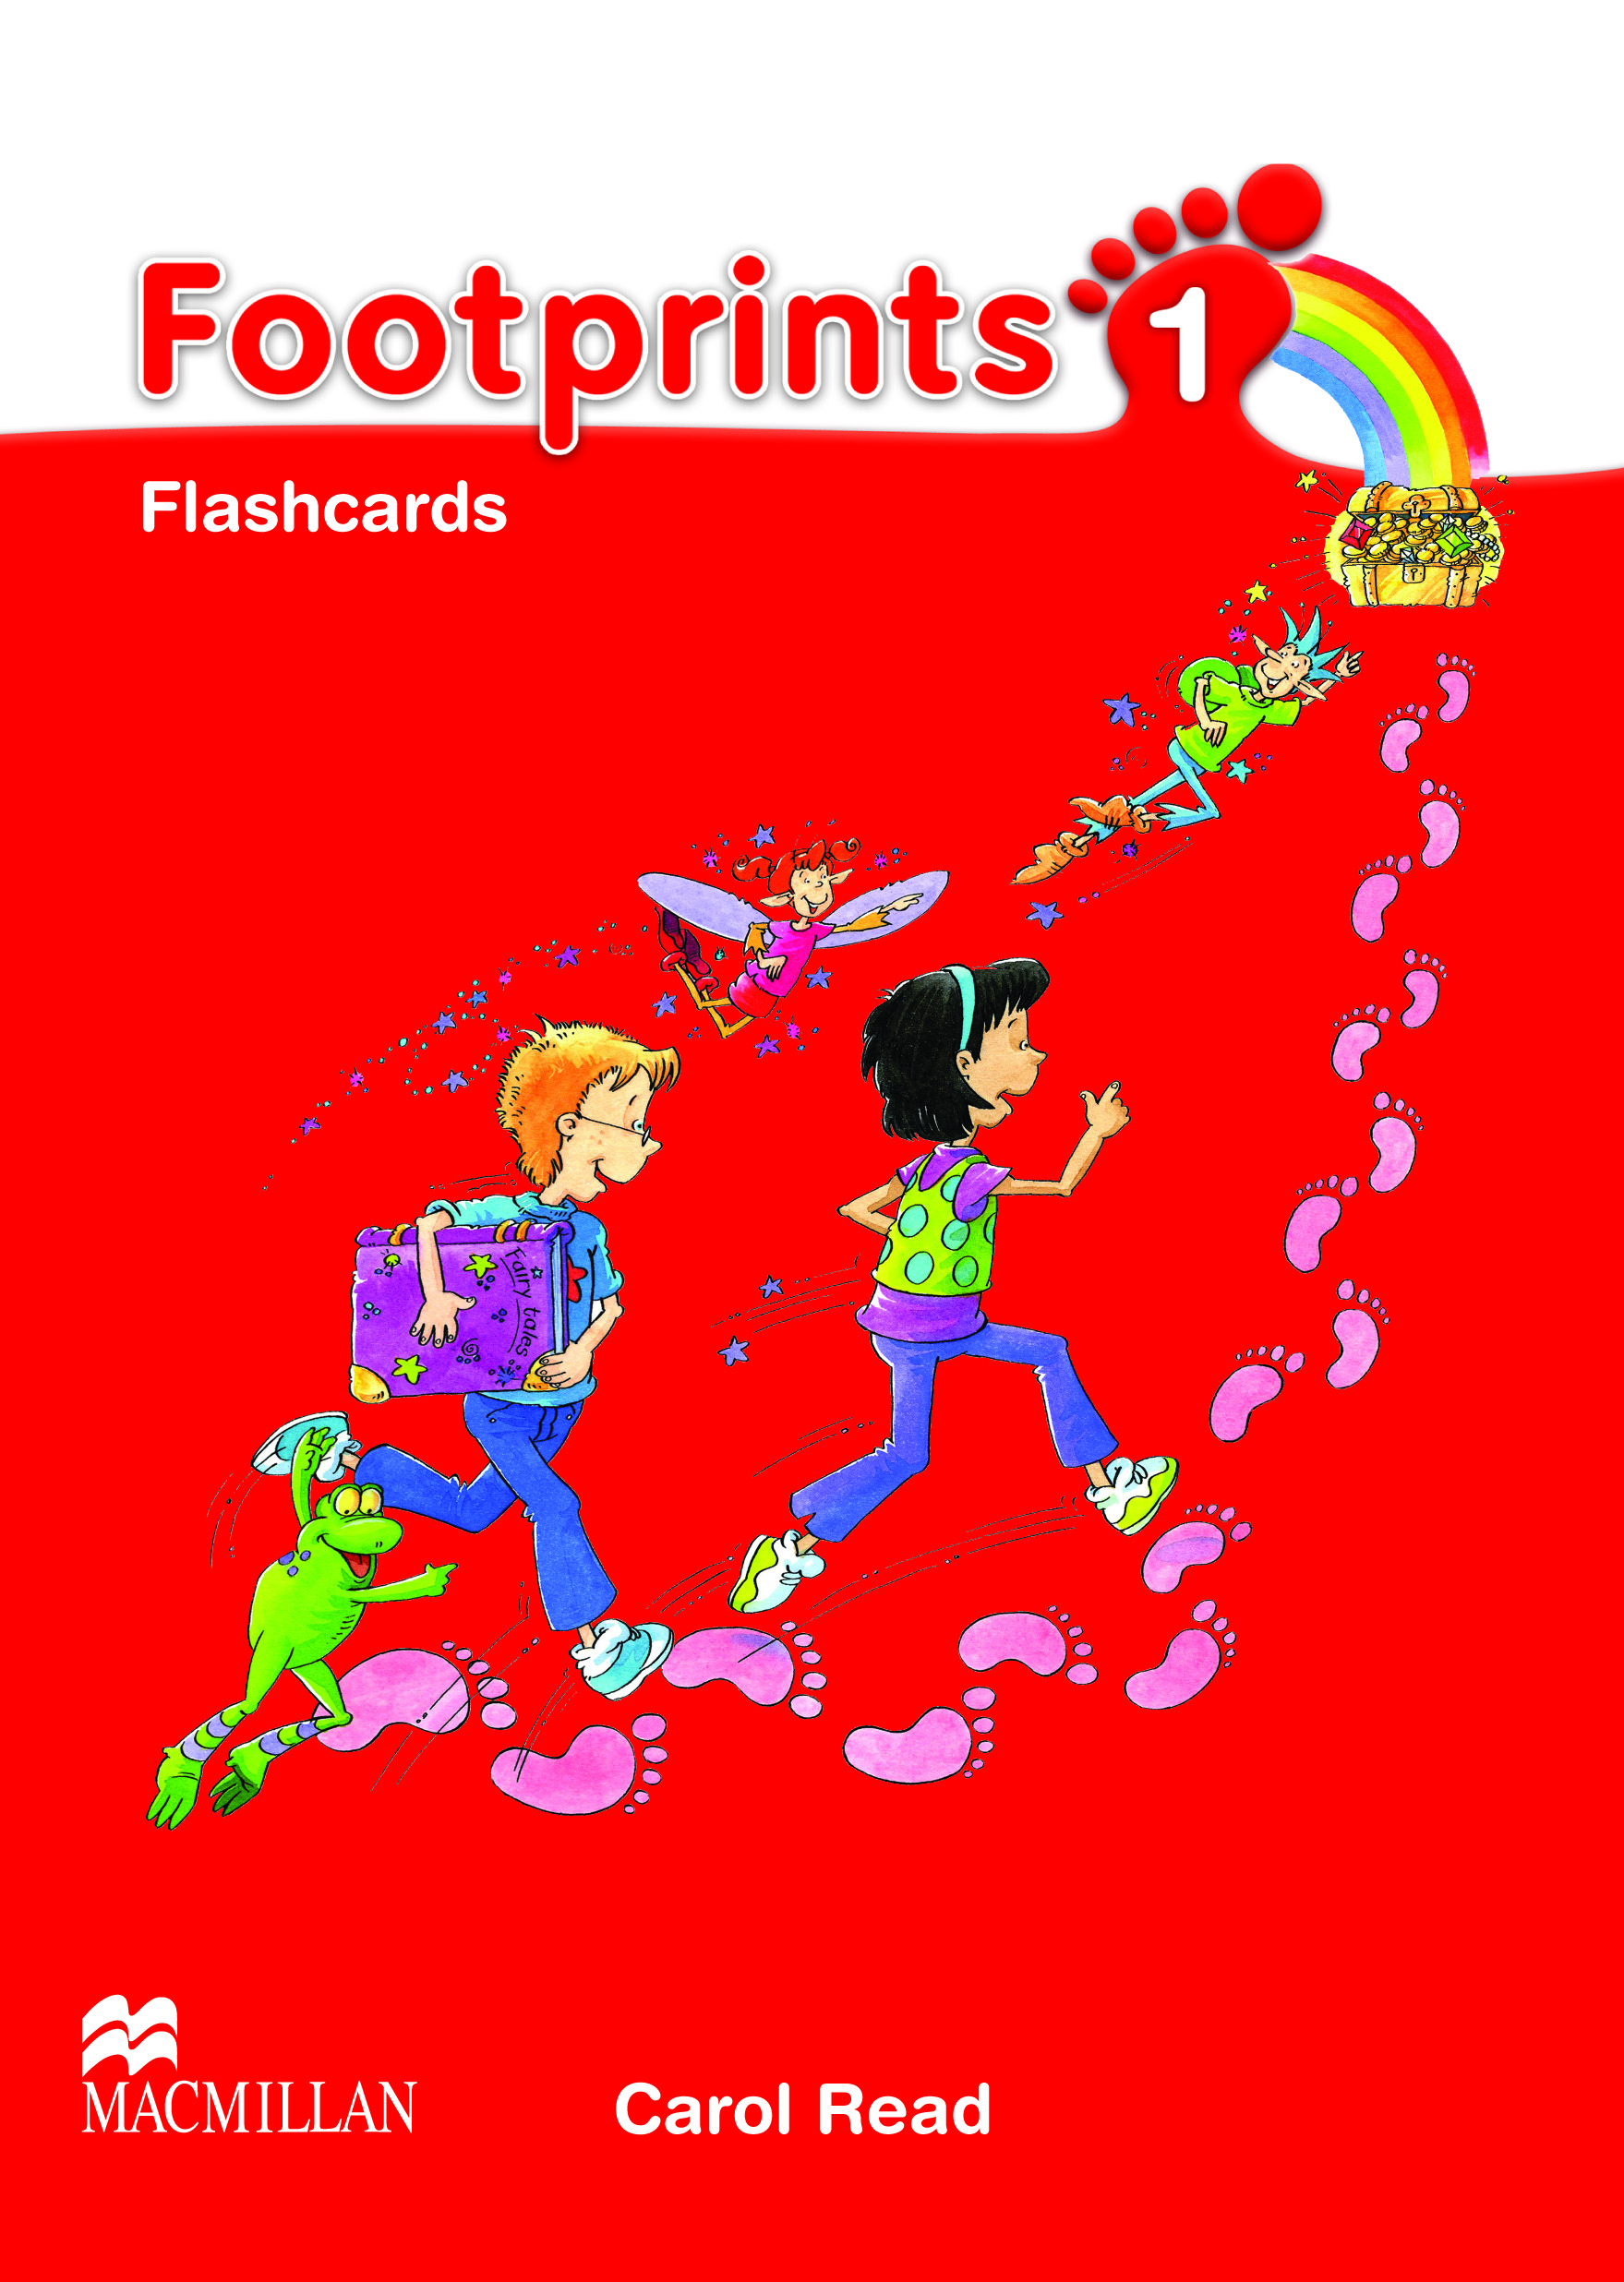 Footprints 1 Flashcards